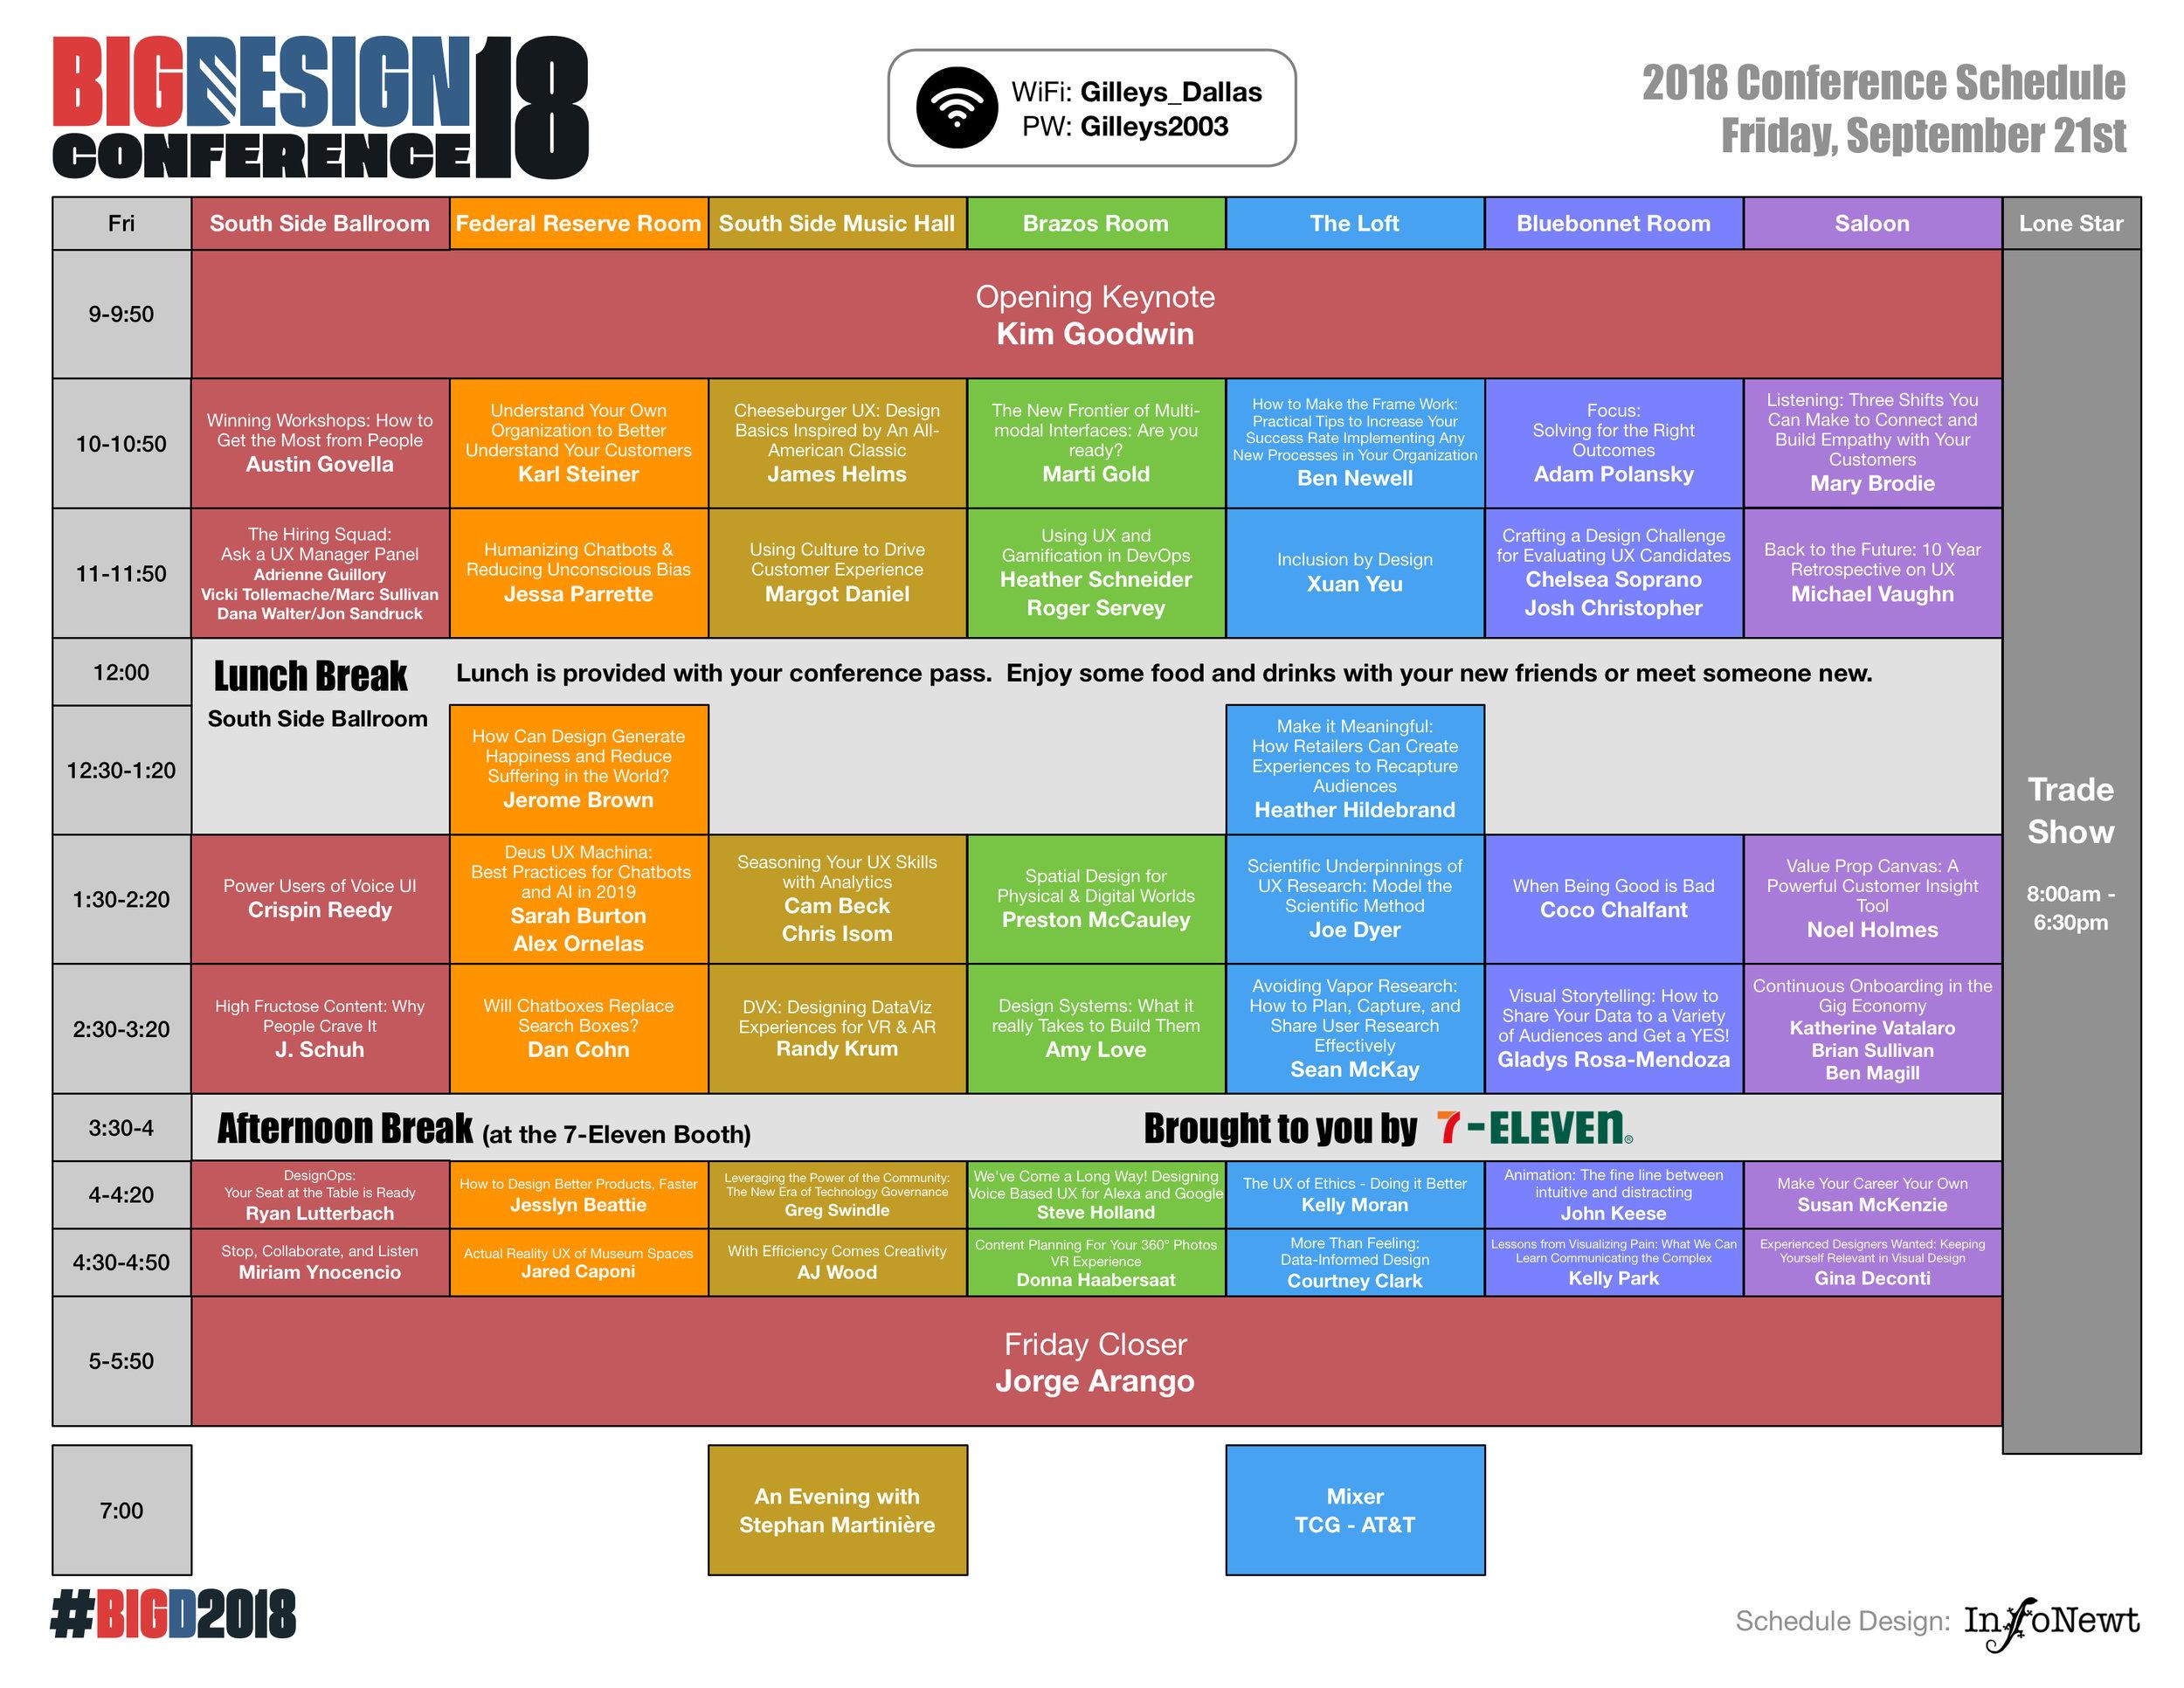 Big Design Conference 2018 Schedule